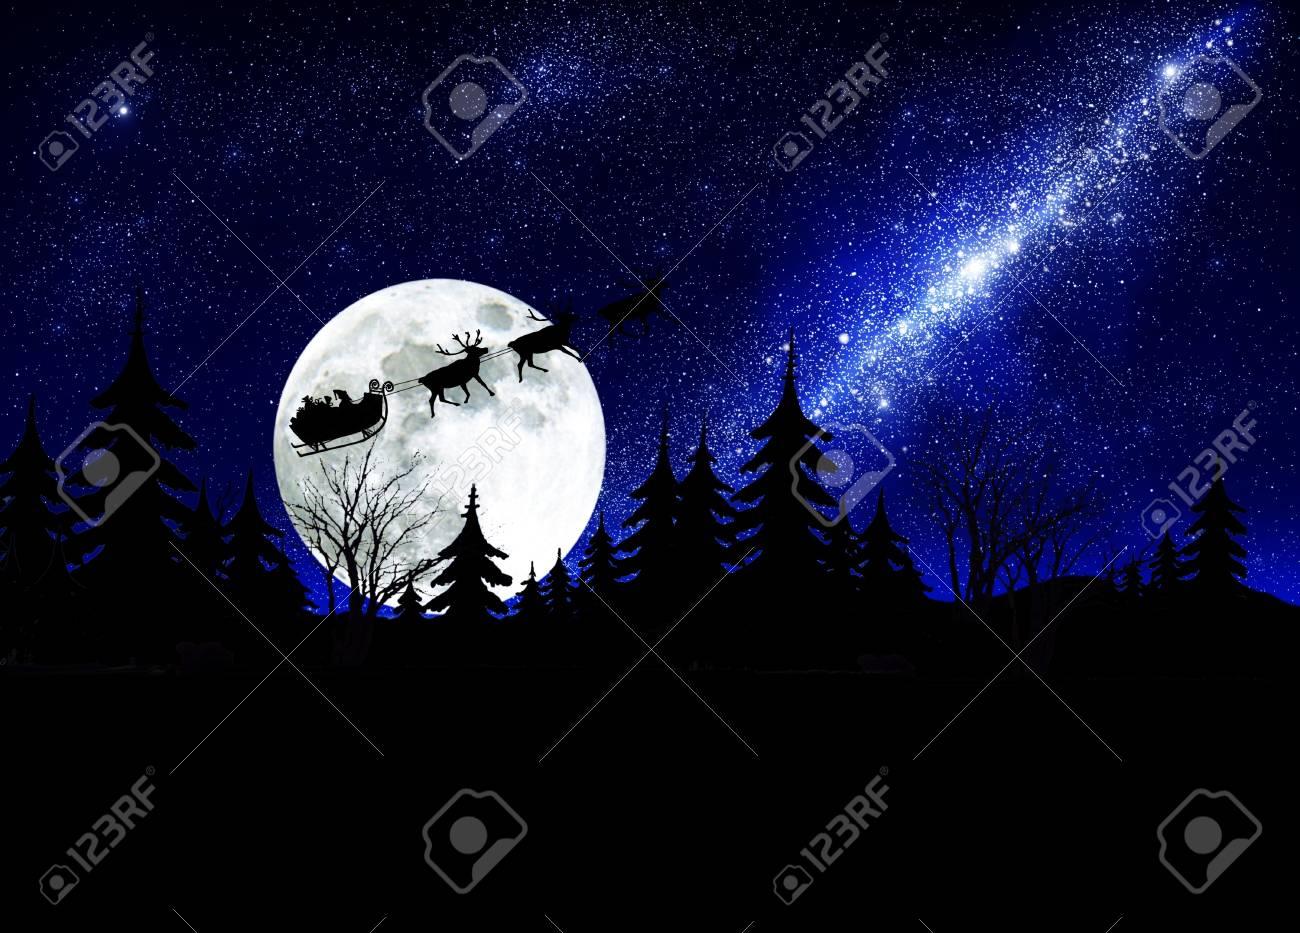 santa claus on sky background - 8273908